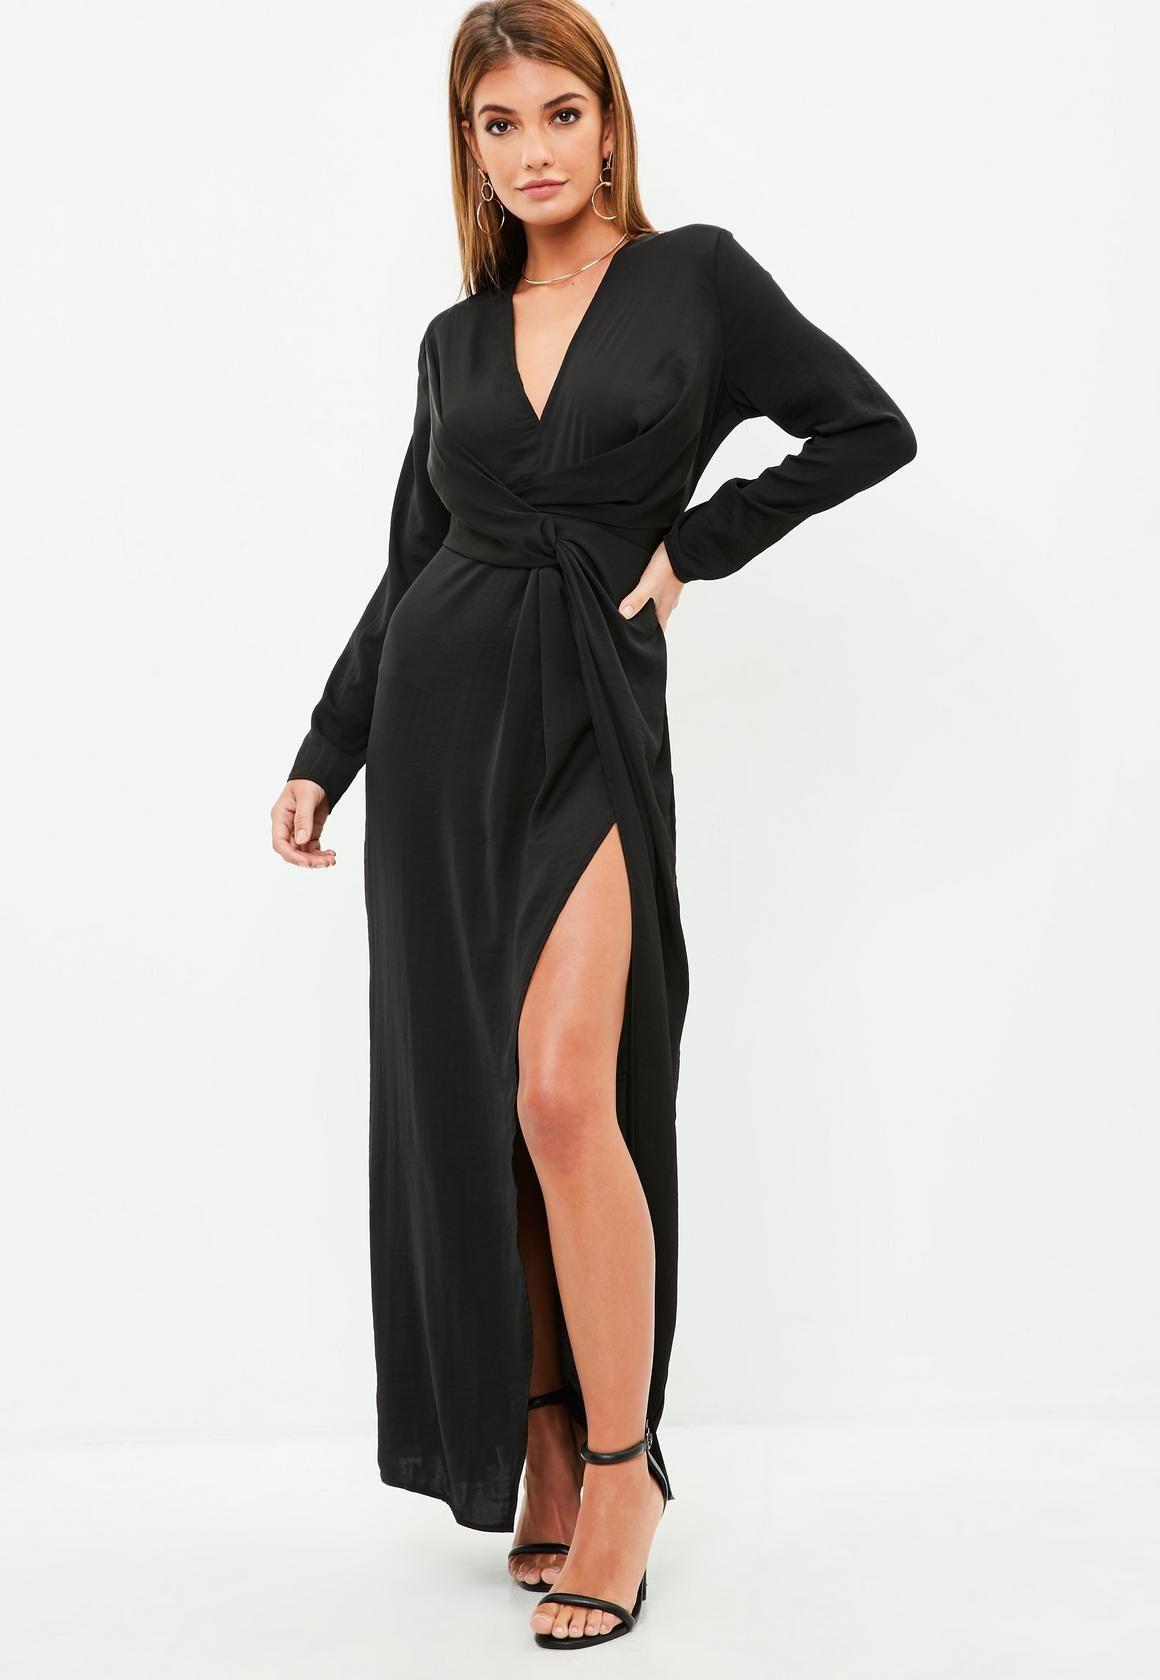 Missguided Black Wrap Front Shirt Maxi Dress Ruched Maxi Dress Maxi Dress Maxi Jersey Dress [ 1680 x 1160 Pixel ]